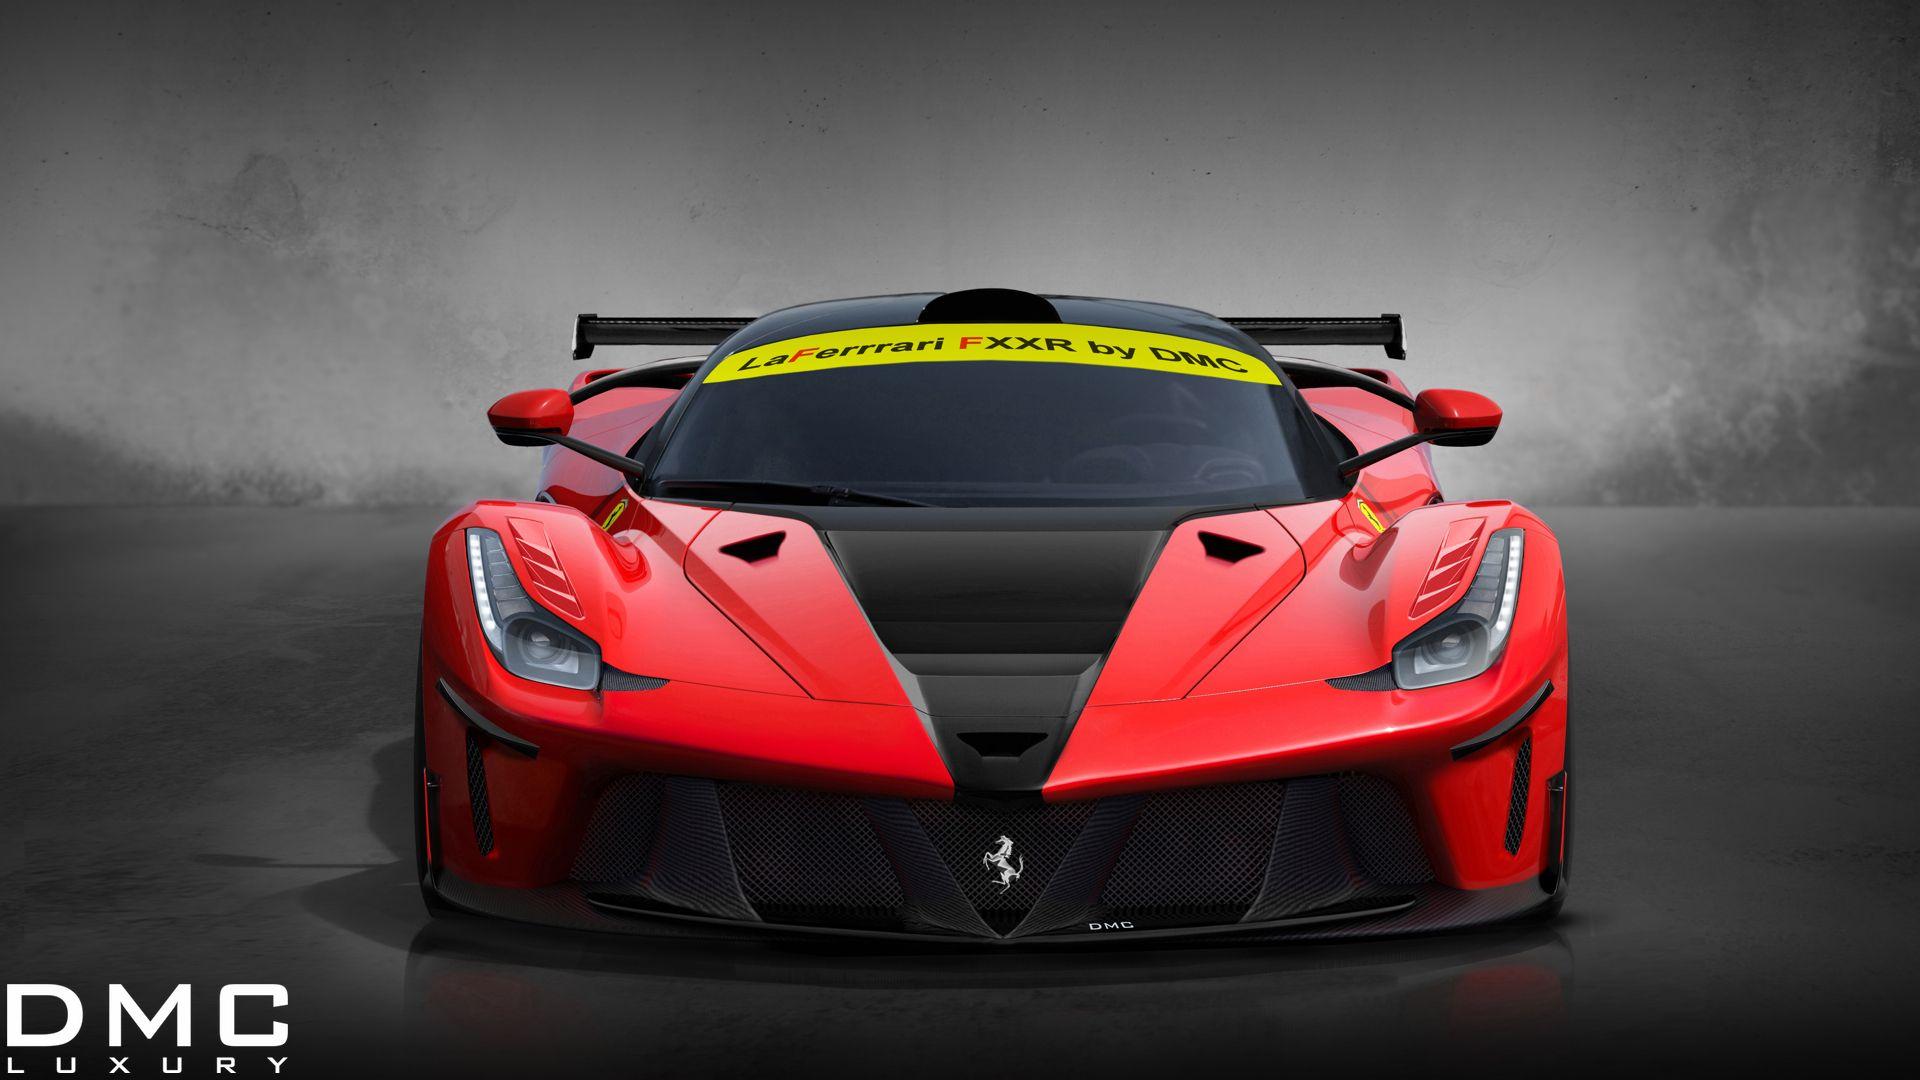 Ferrari Laferrari Fxxr By Dmc Super Carros Carros De Luxo Auto